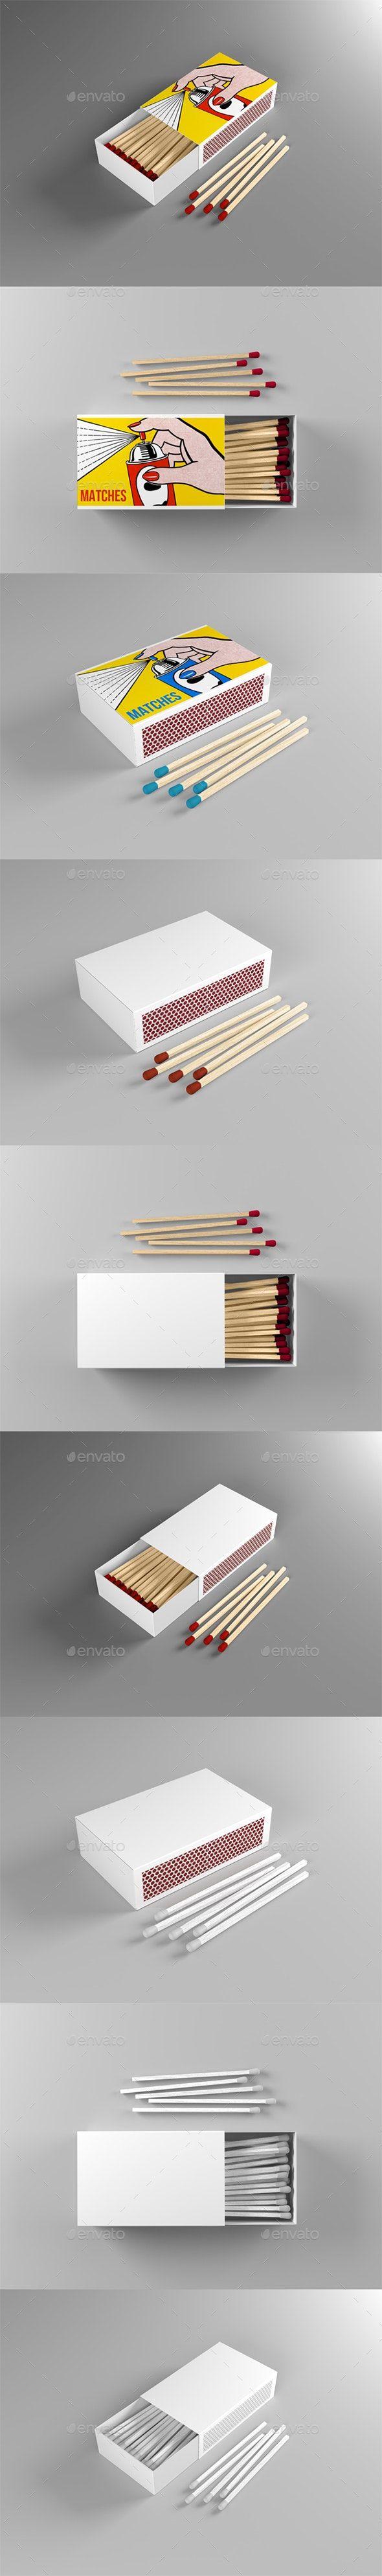 Download Match Box Mock Up Mockup Design Graphic Design Templates Matchbox